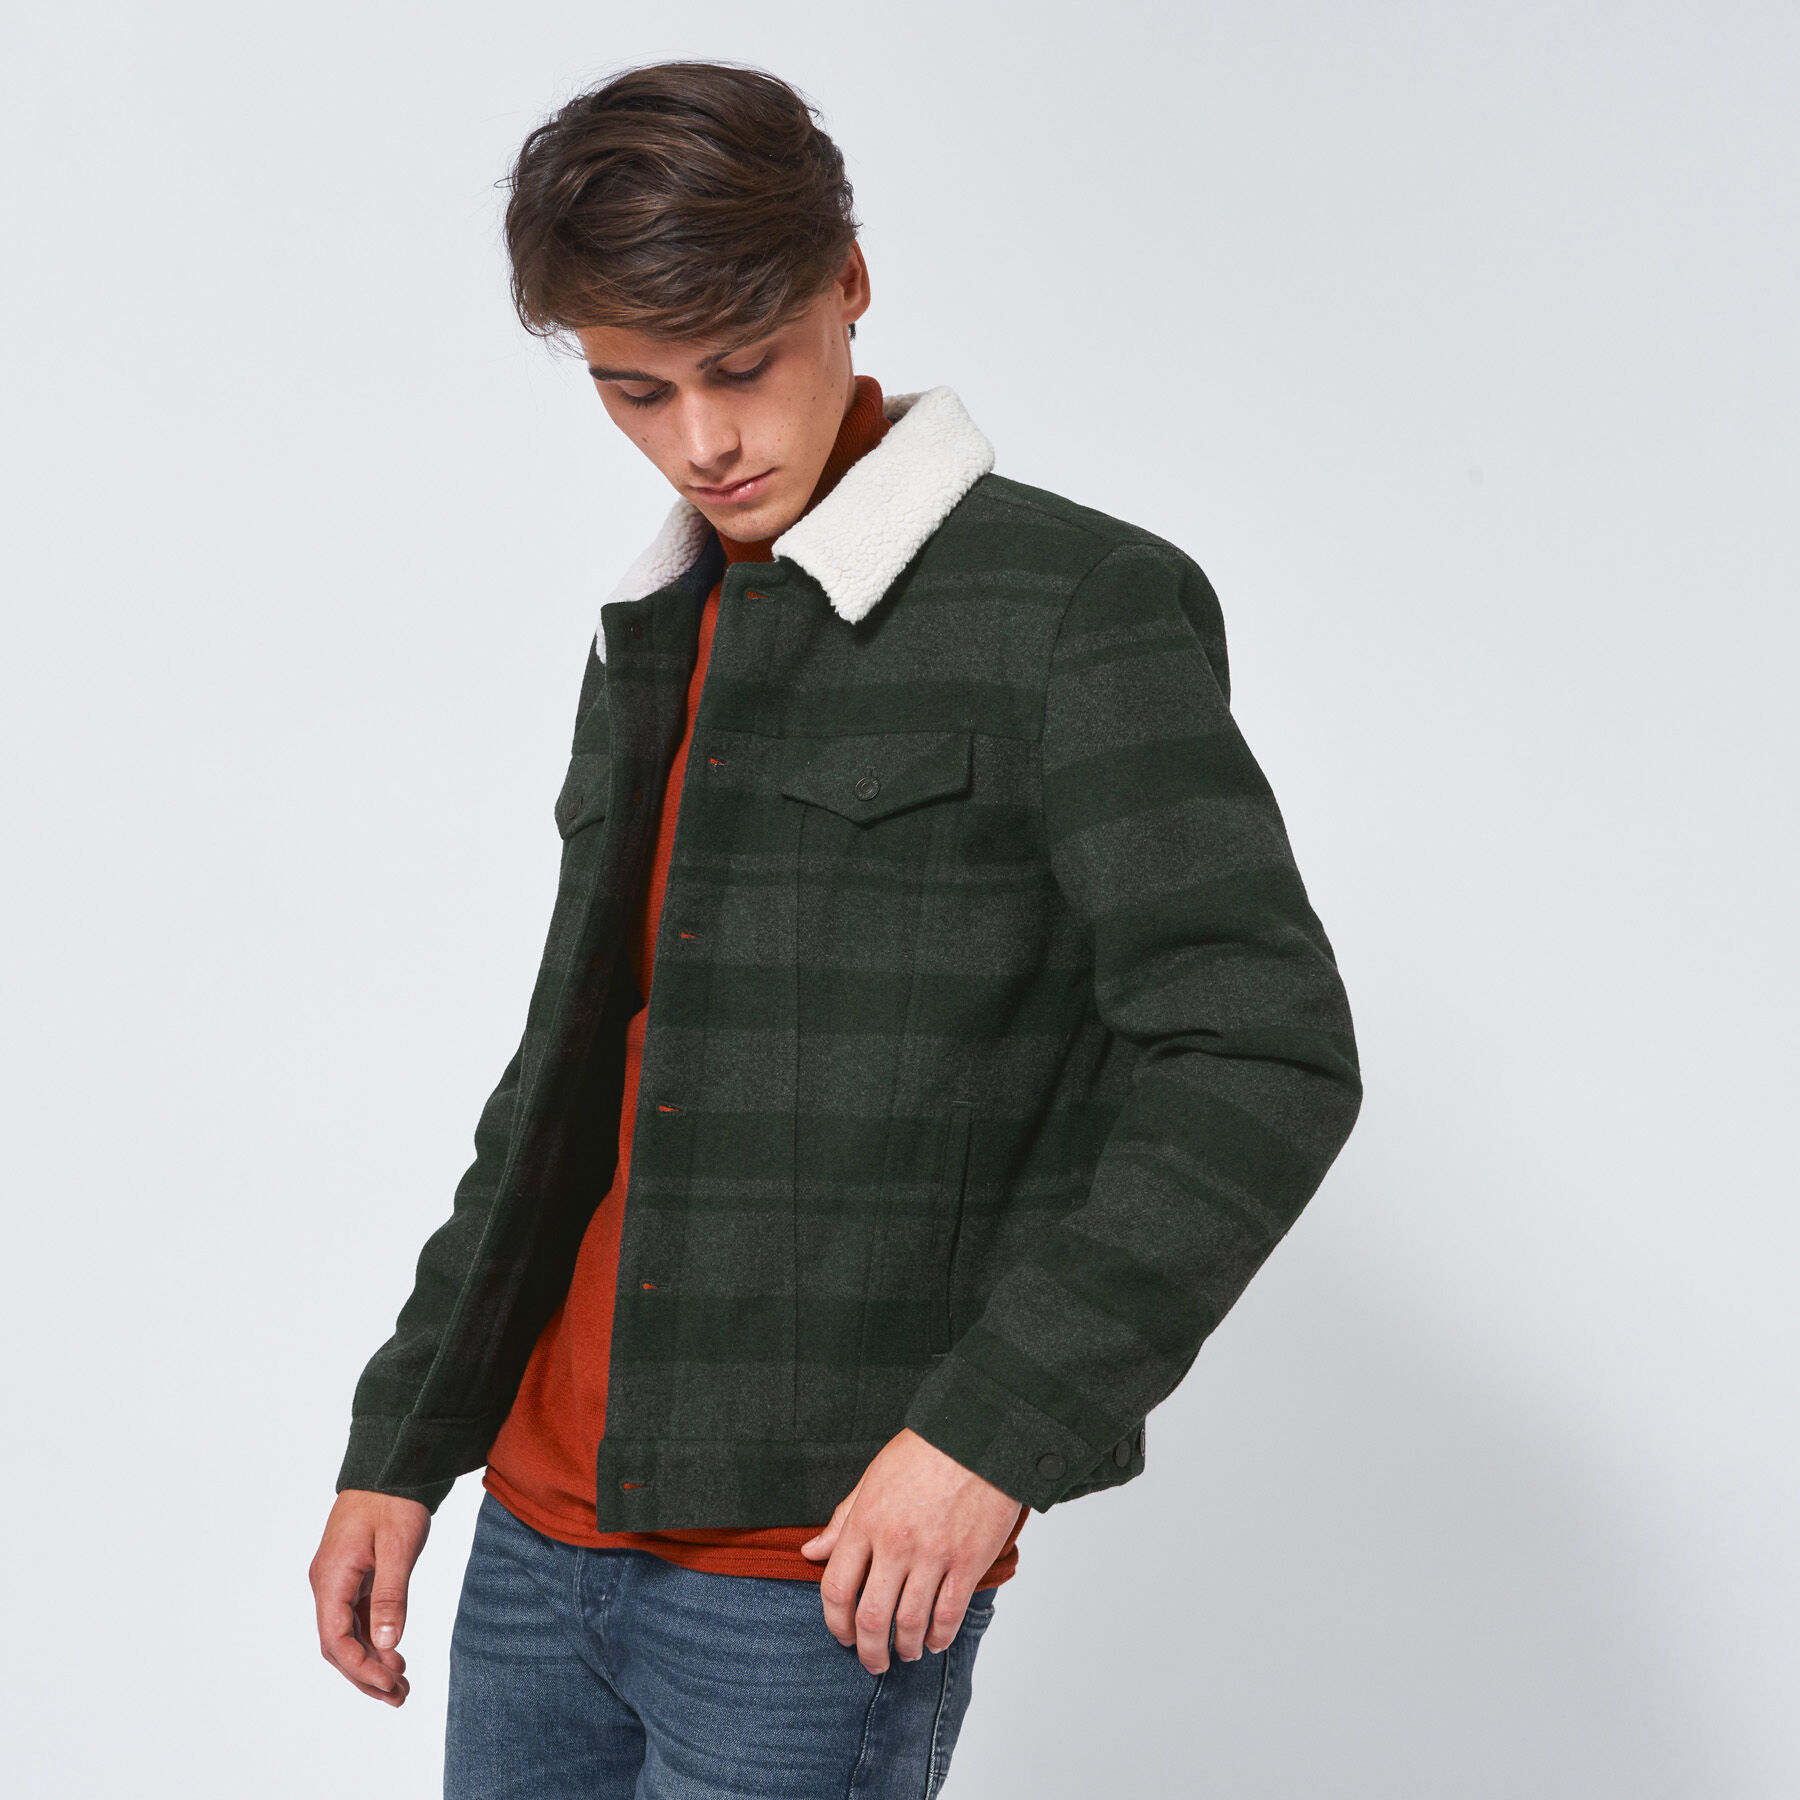 Kaufen Trainingsjacke Online, Grün Trainingsjacke zum Herren